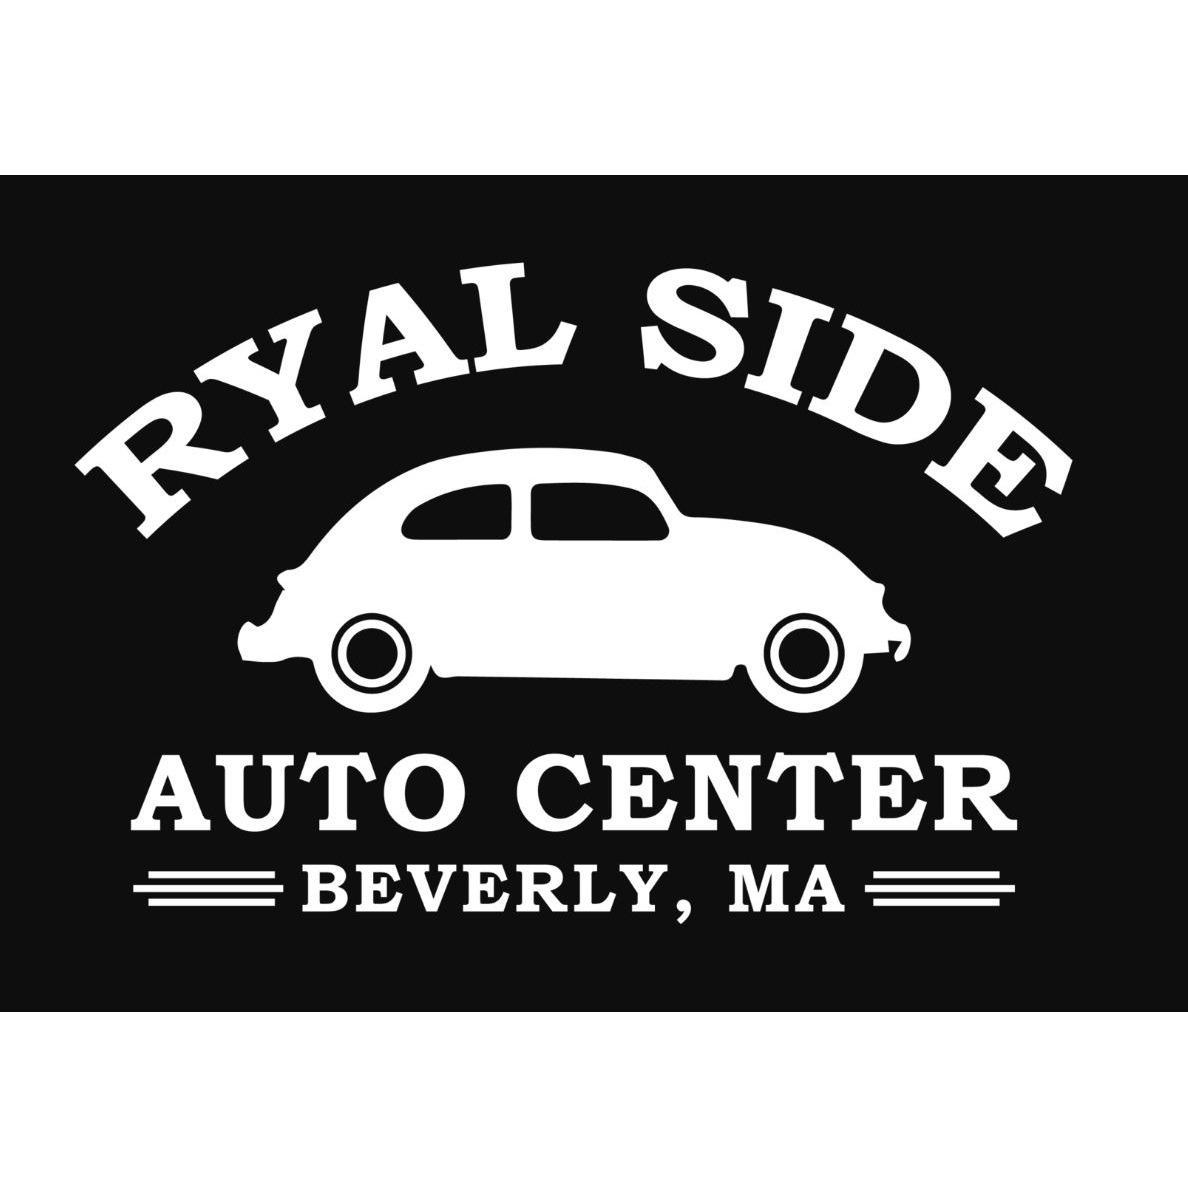 Ryal Side Auto Center